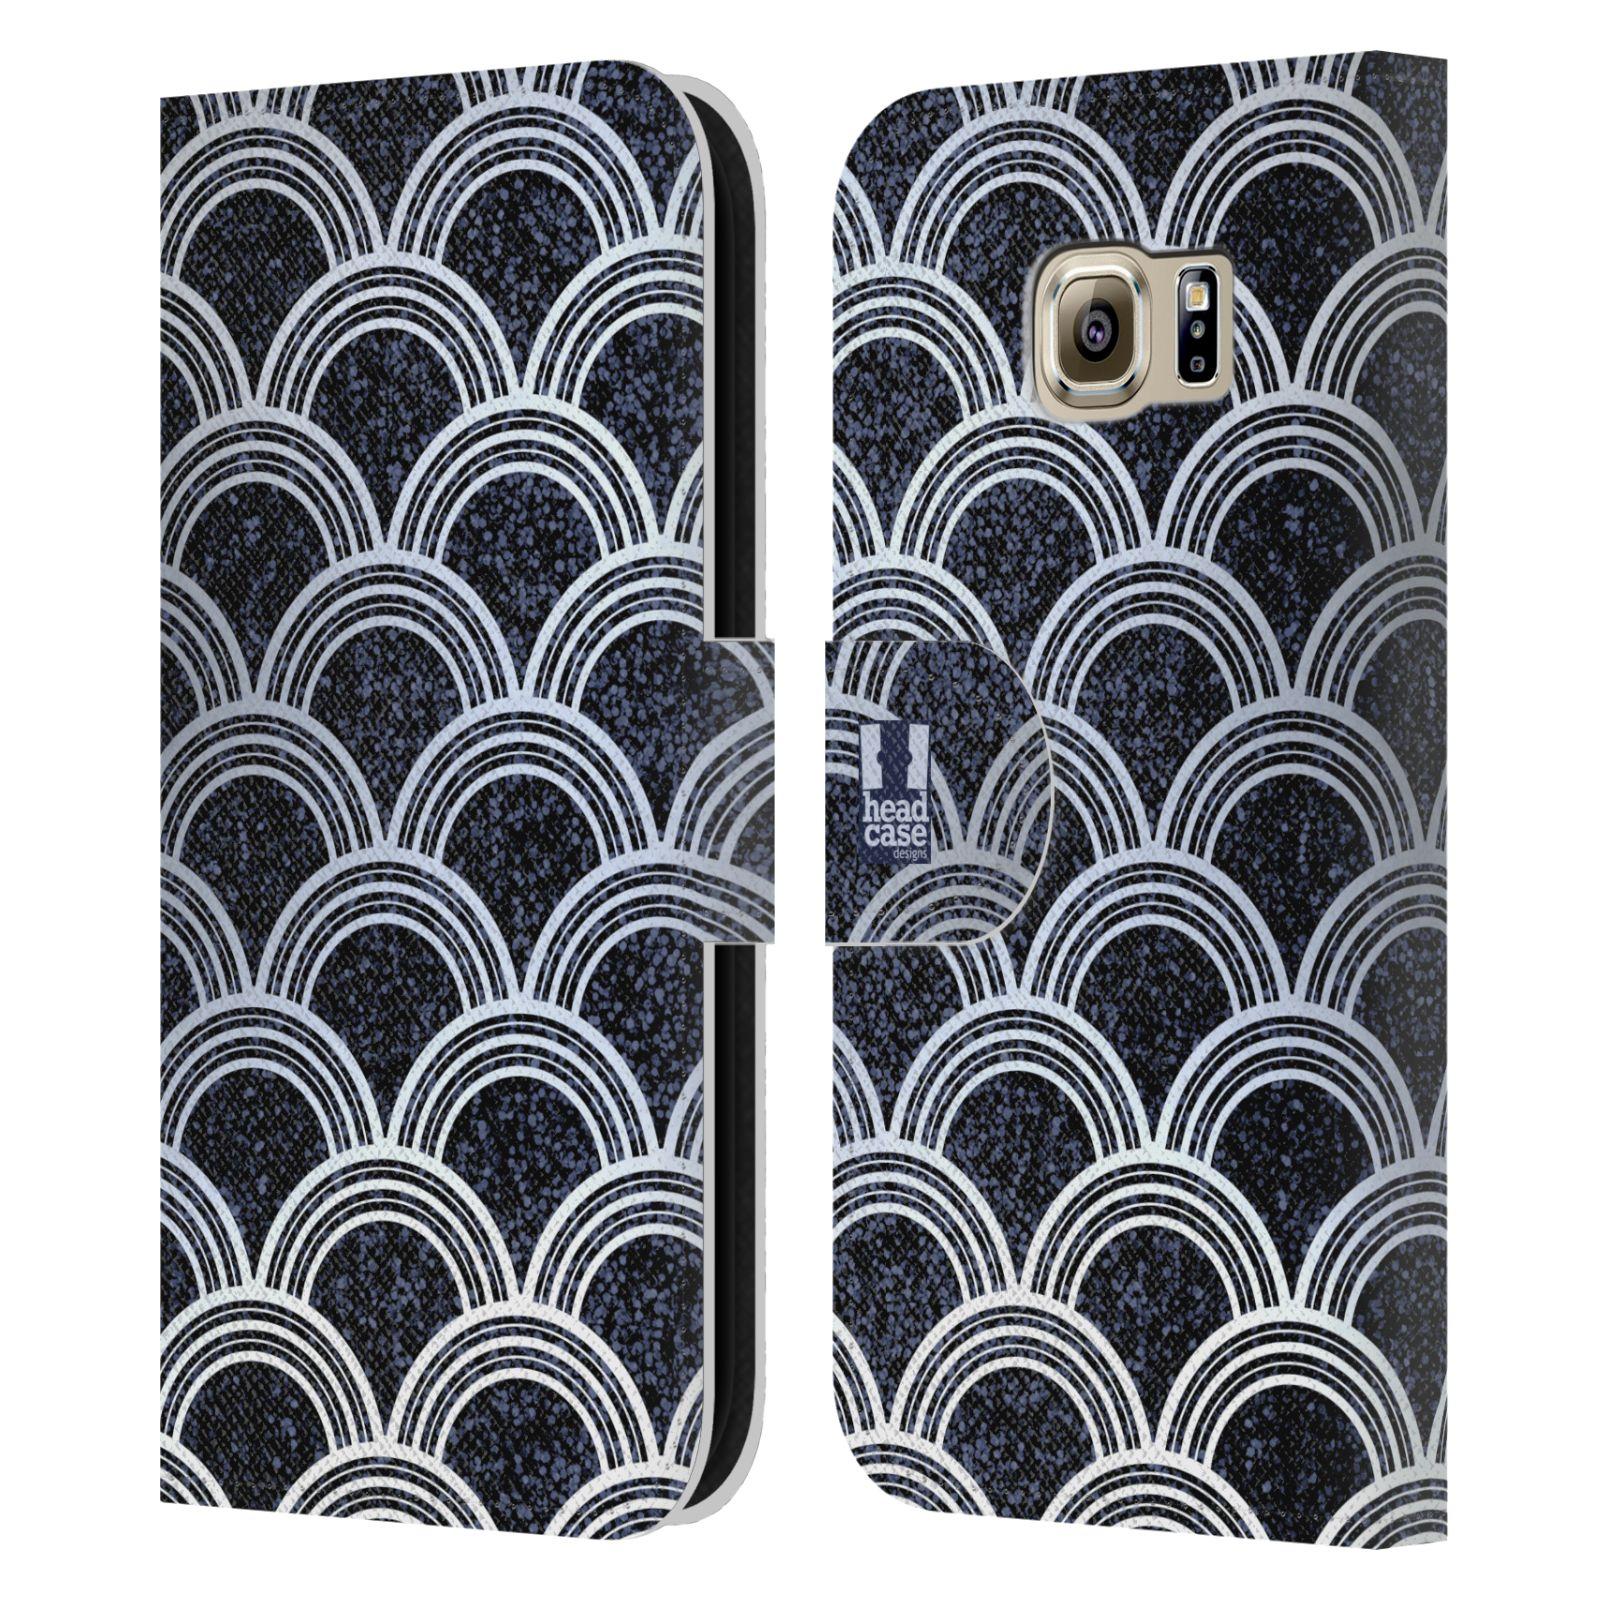 head case designs texture art deco muster brieftasche h lle f r samsung handys 1 ebay. Black Bedroom Furniture Sets. Home Design Ideas